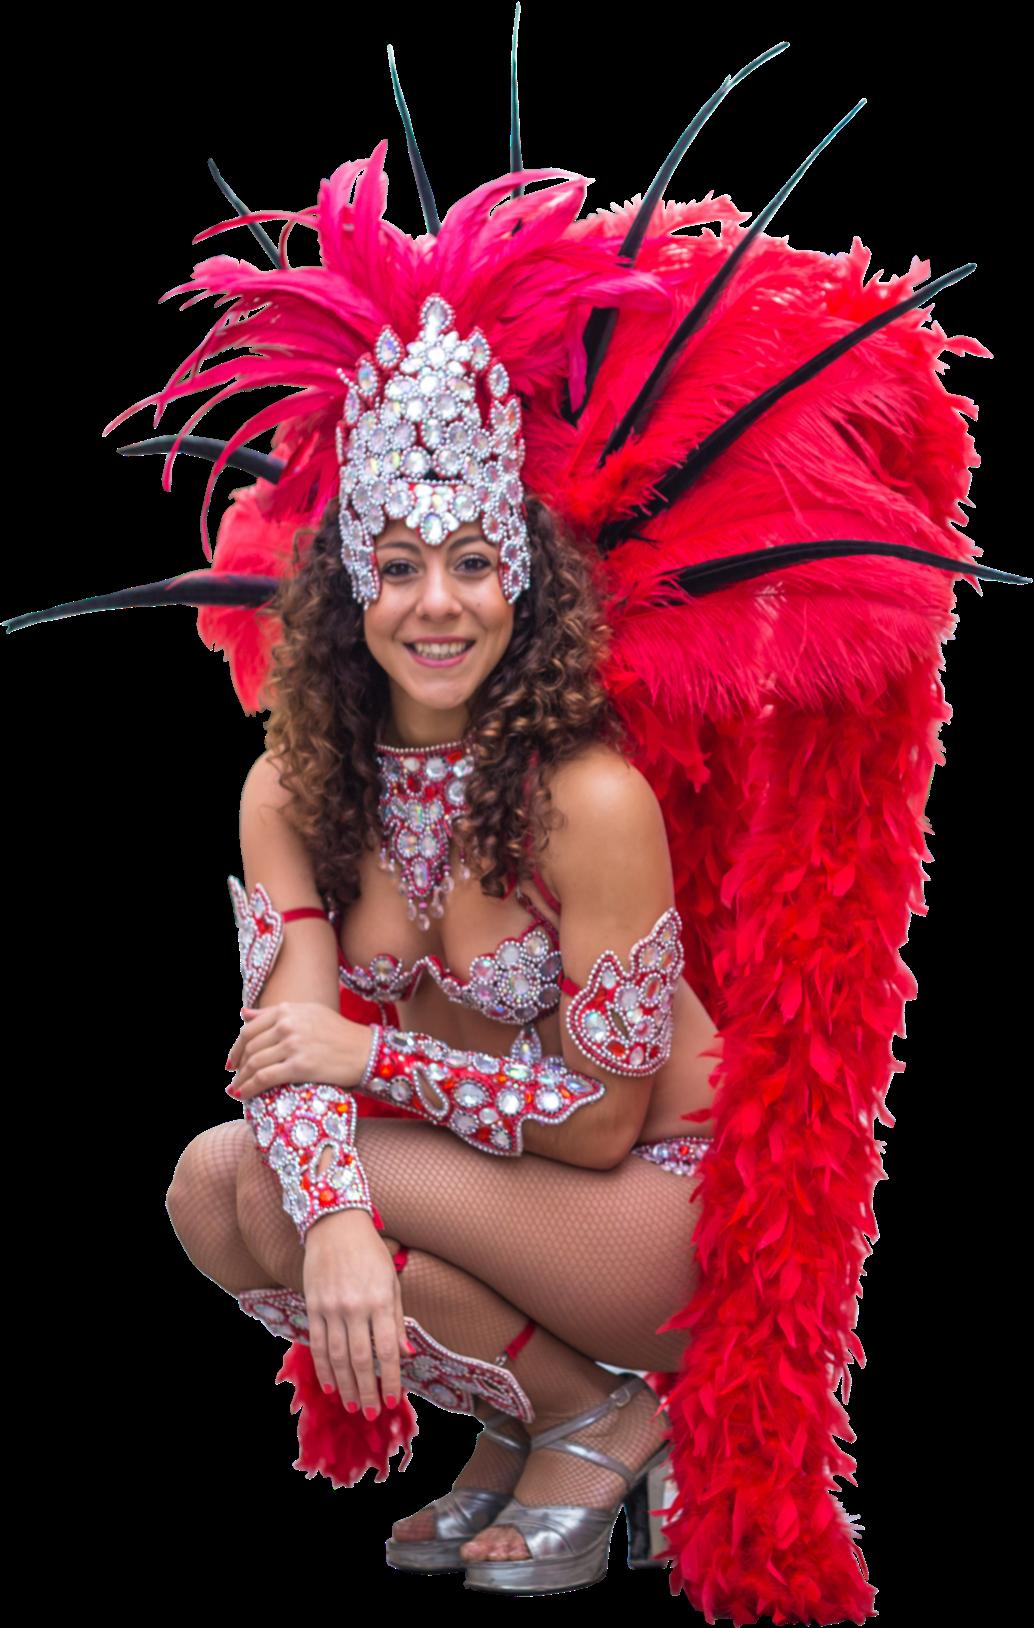 Laina Lilaséna troupe de samba brésilienne